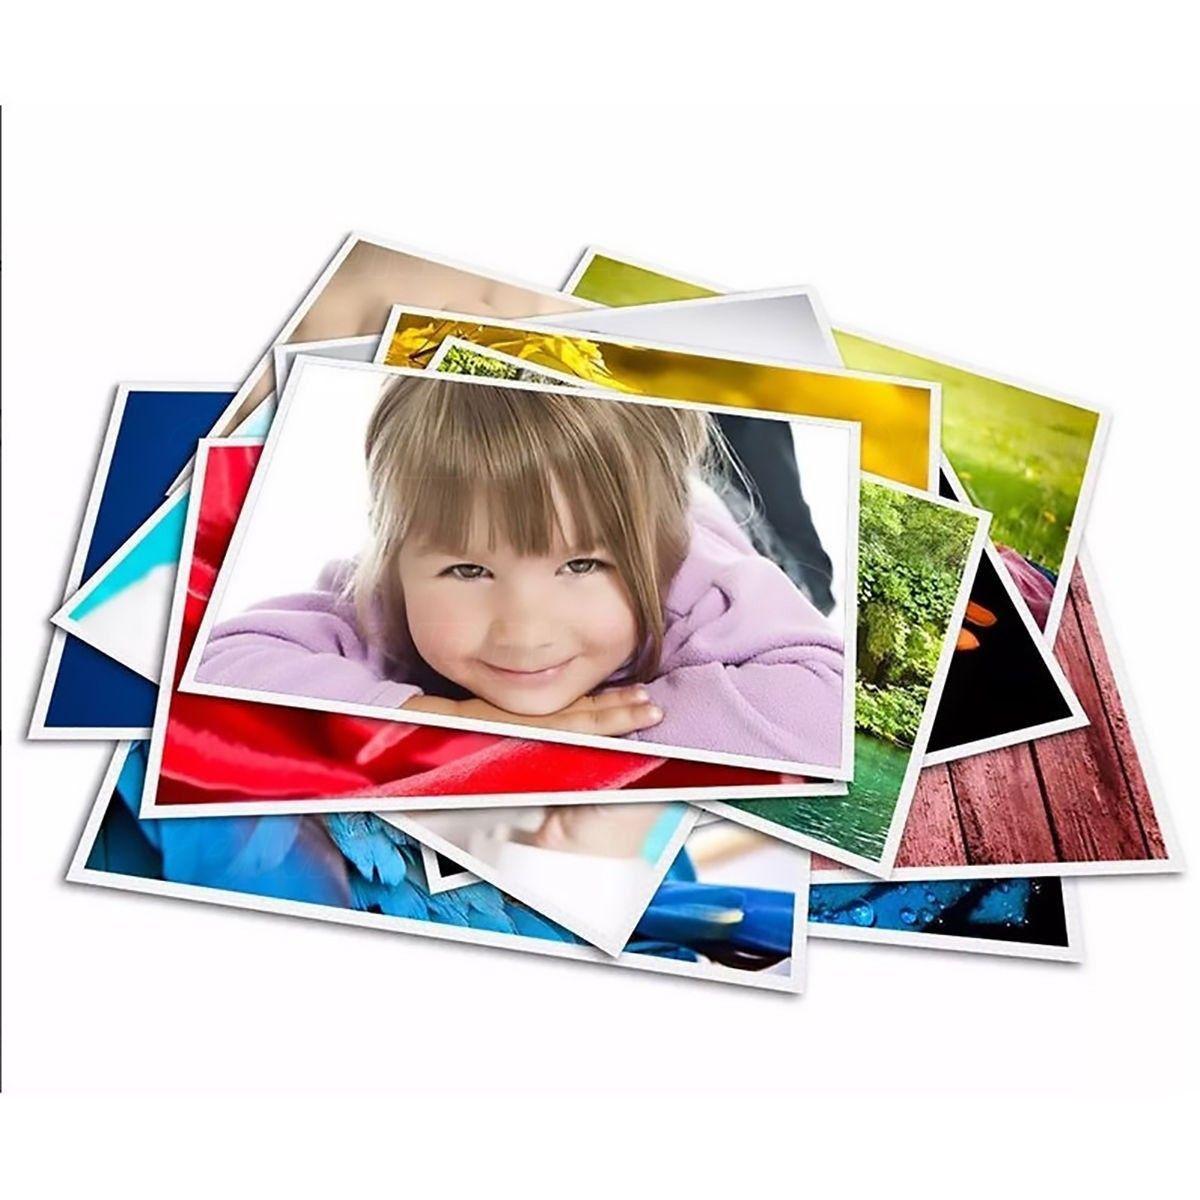 Papel Fotográfico 115g A4  50 Folhas